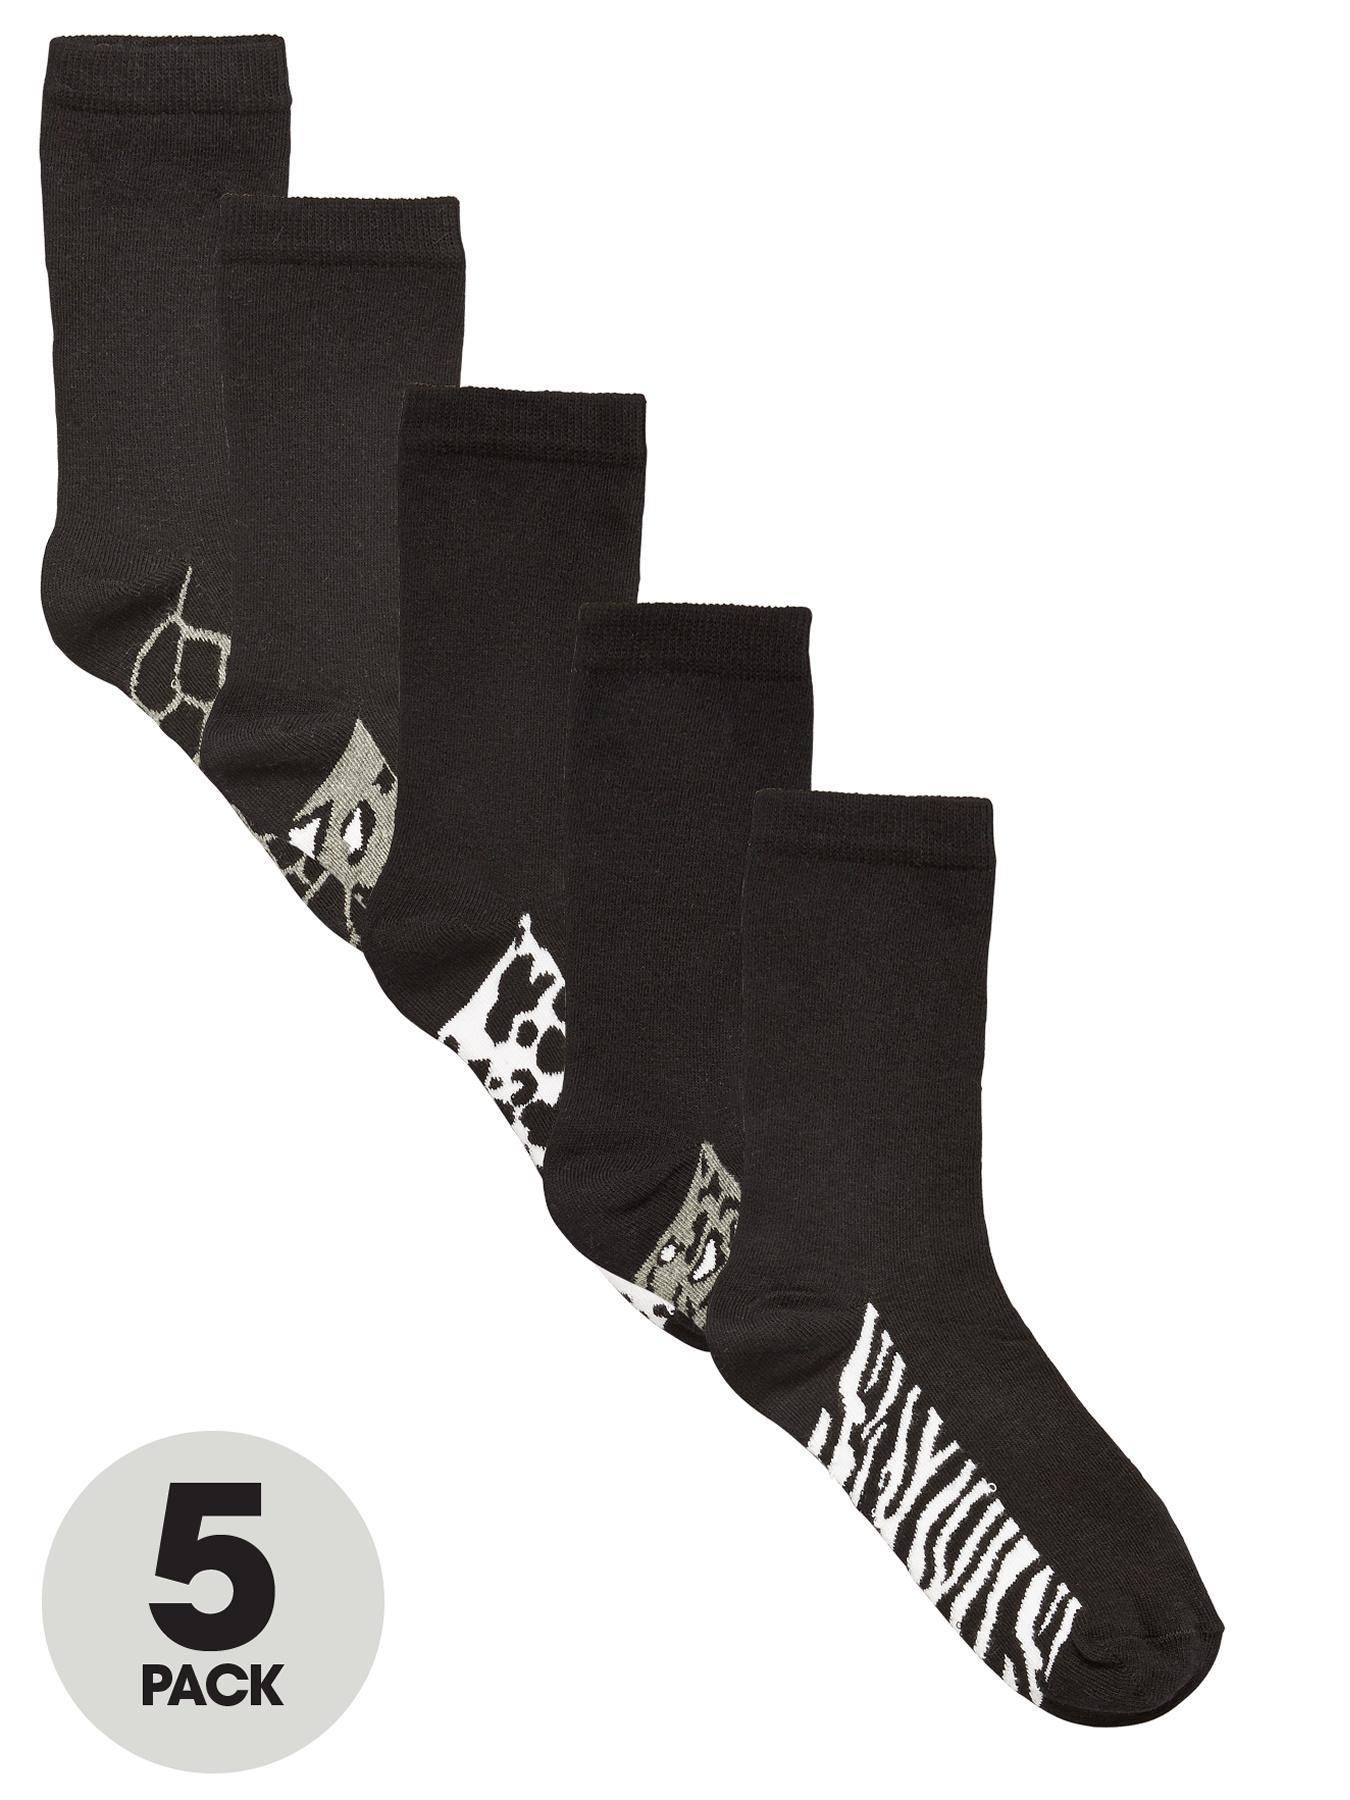 Animal Footbed Crew Socks (5 Pack), Black at Littlewoods